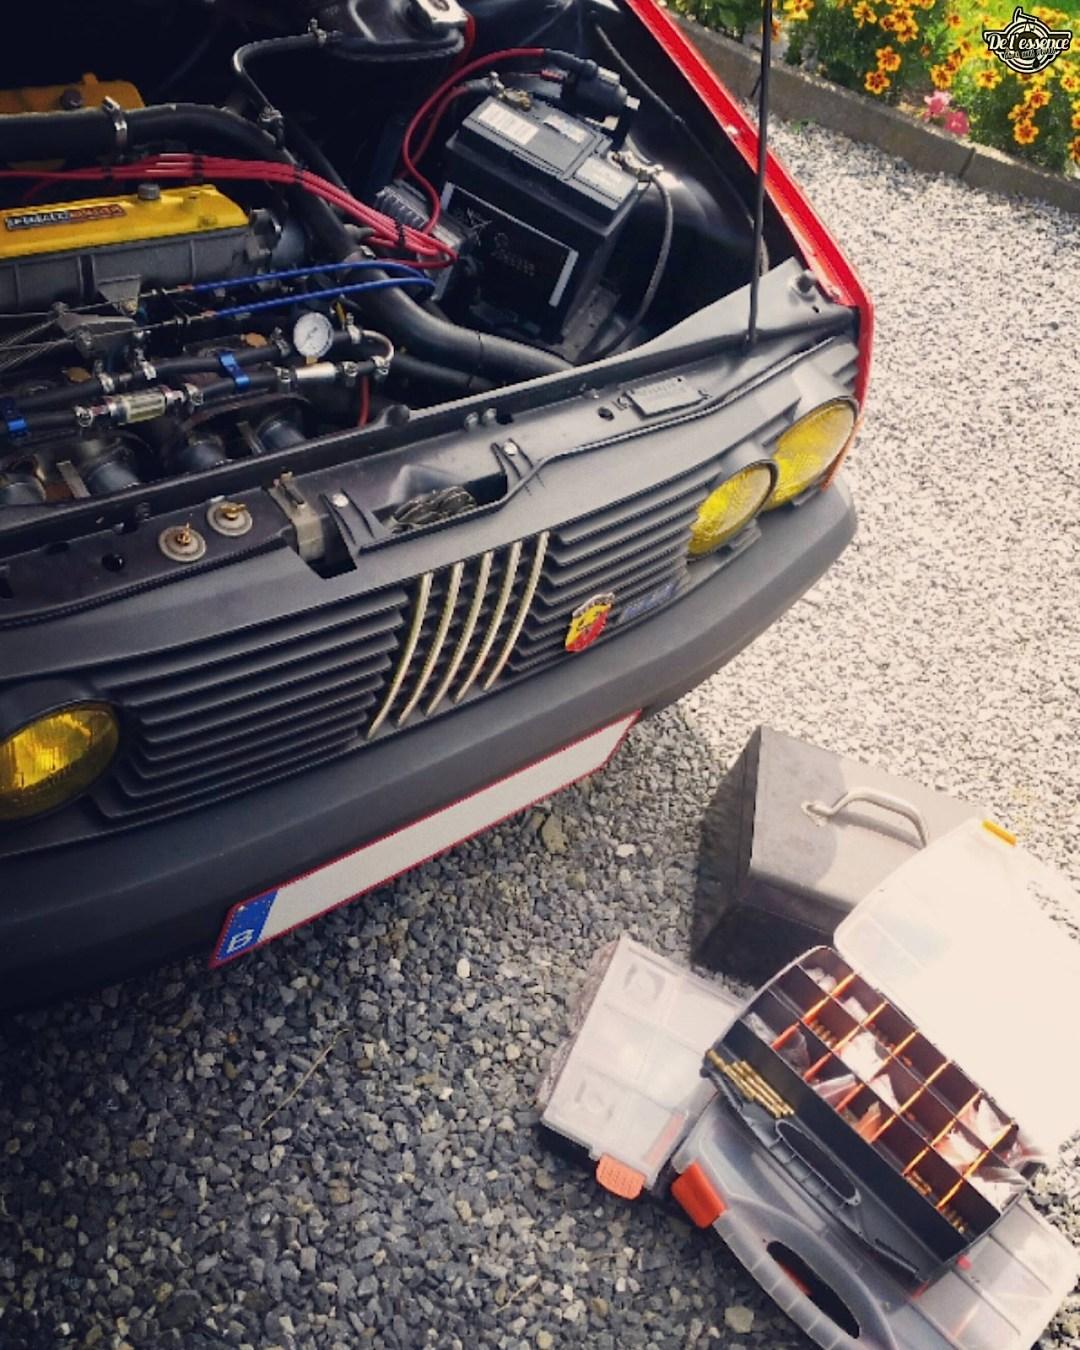 Fiat Ritmo Abarth 130 TC - Le retour du scorpion ! 29